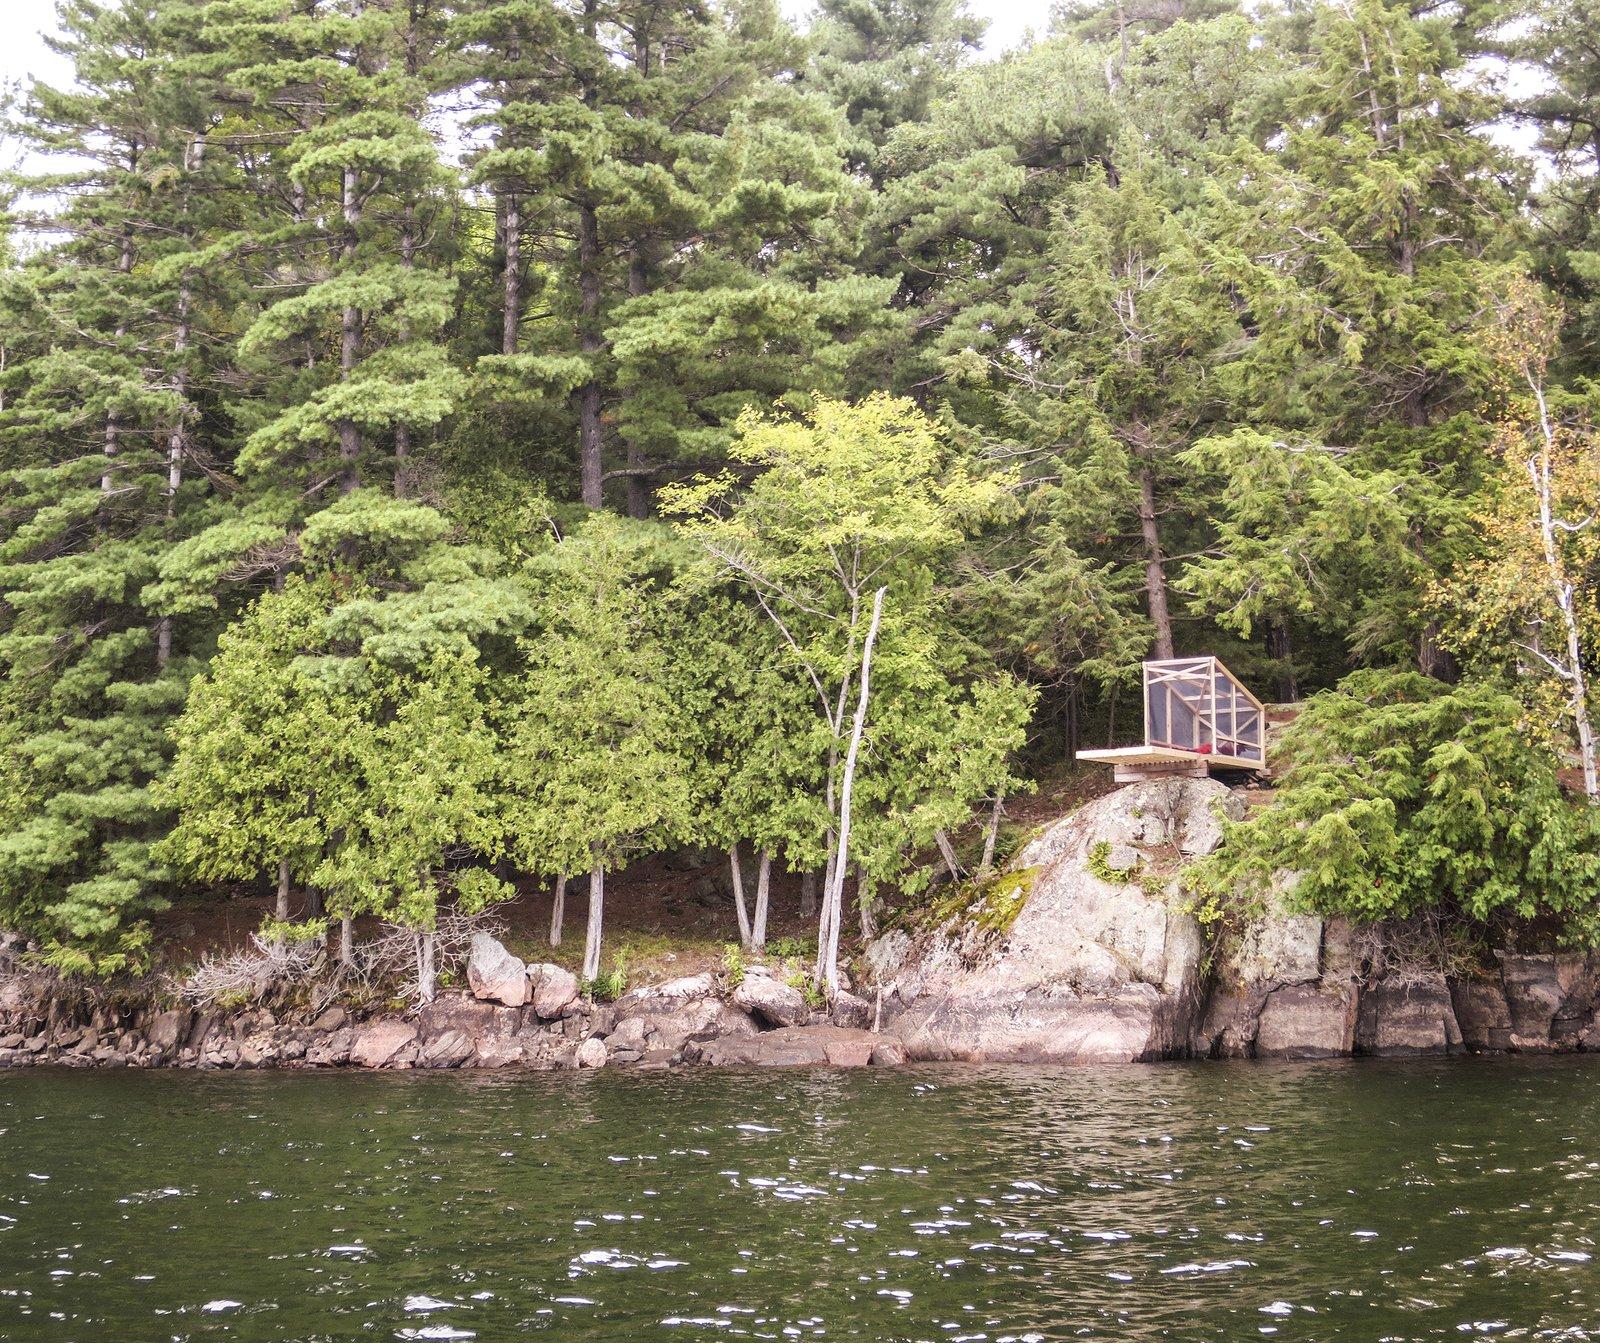 Photo 5 of 6 in Dream/Dive Platform Encourages Playful Summer Living